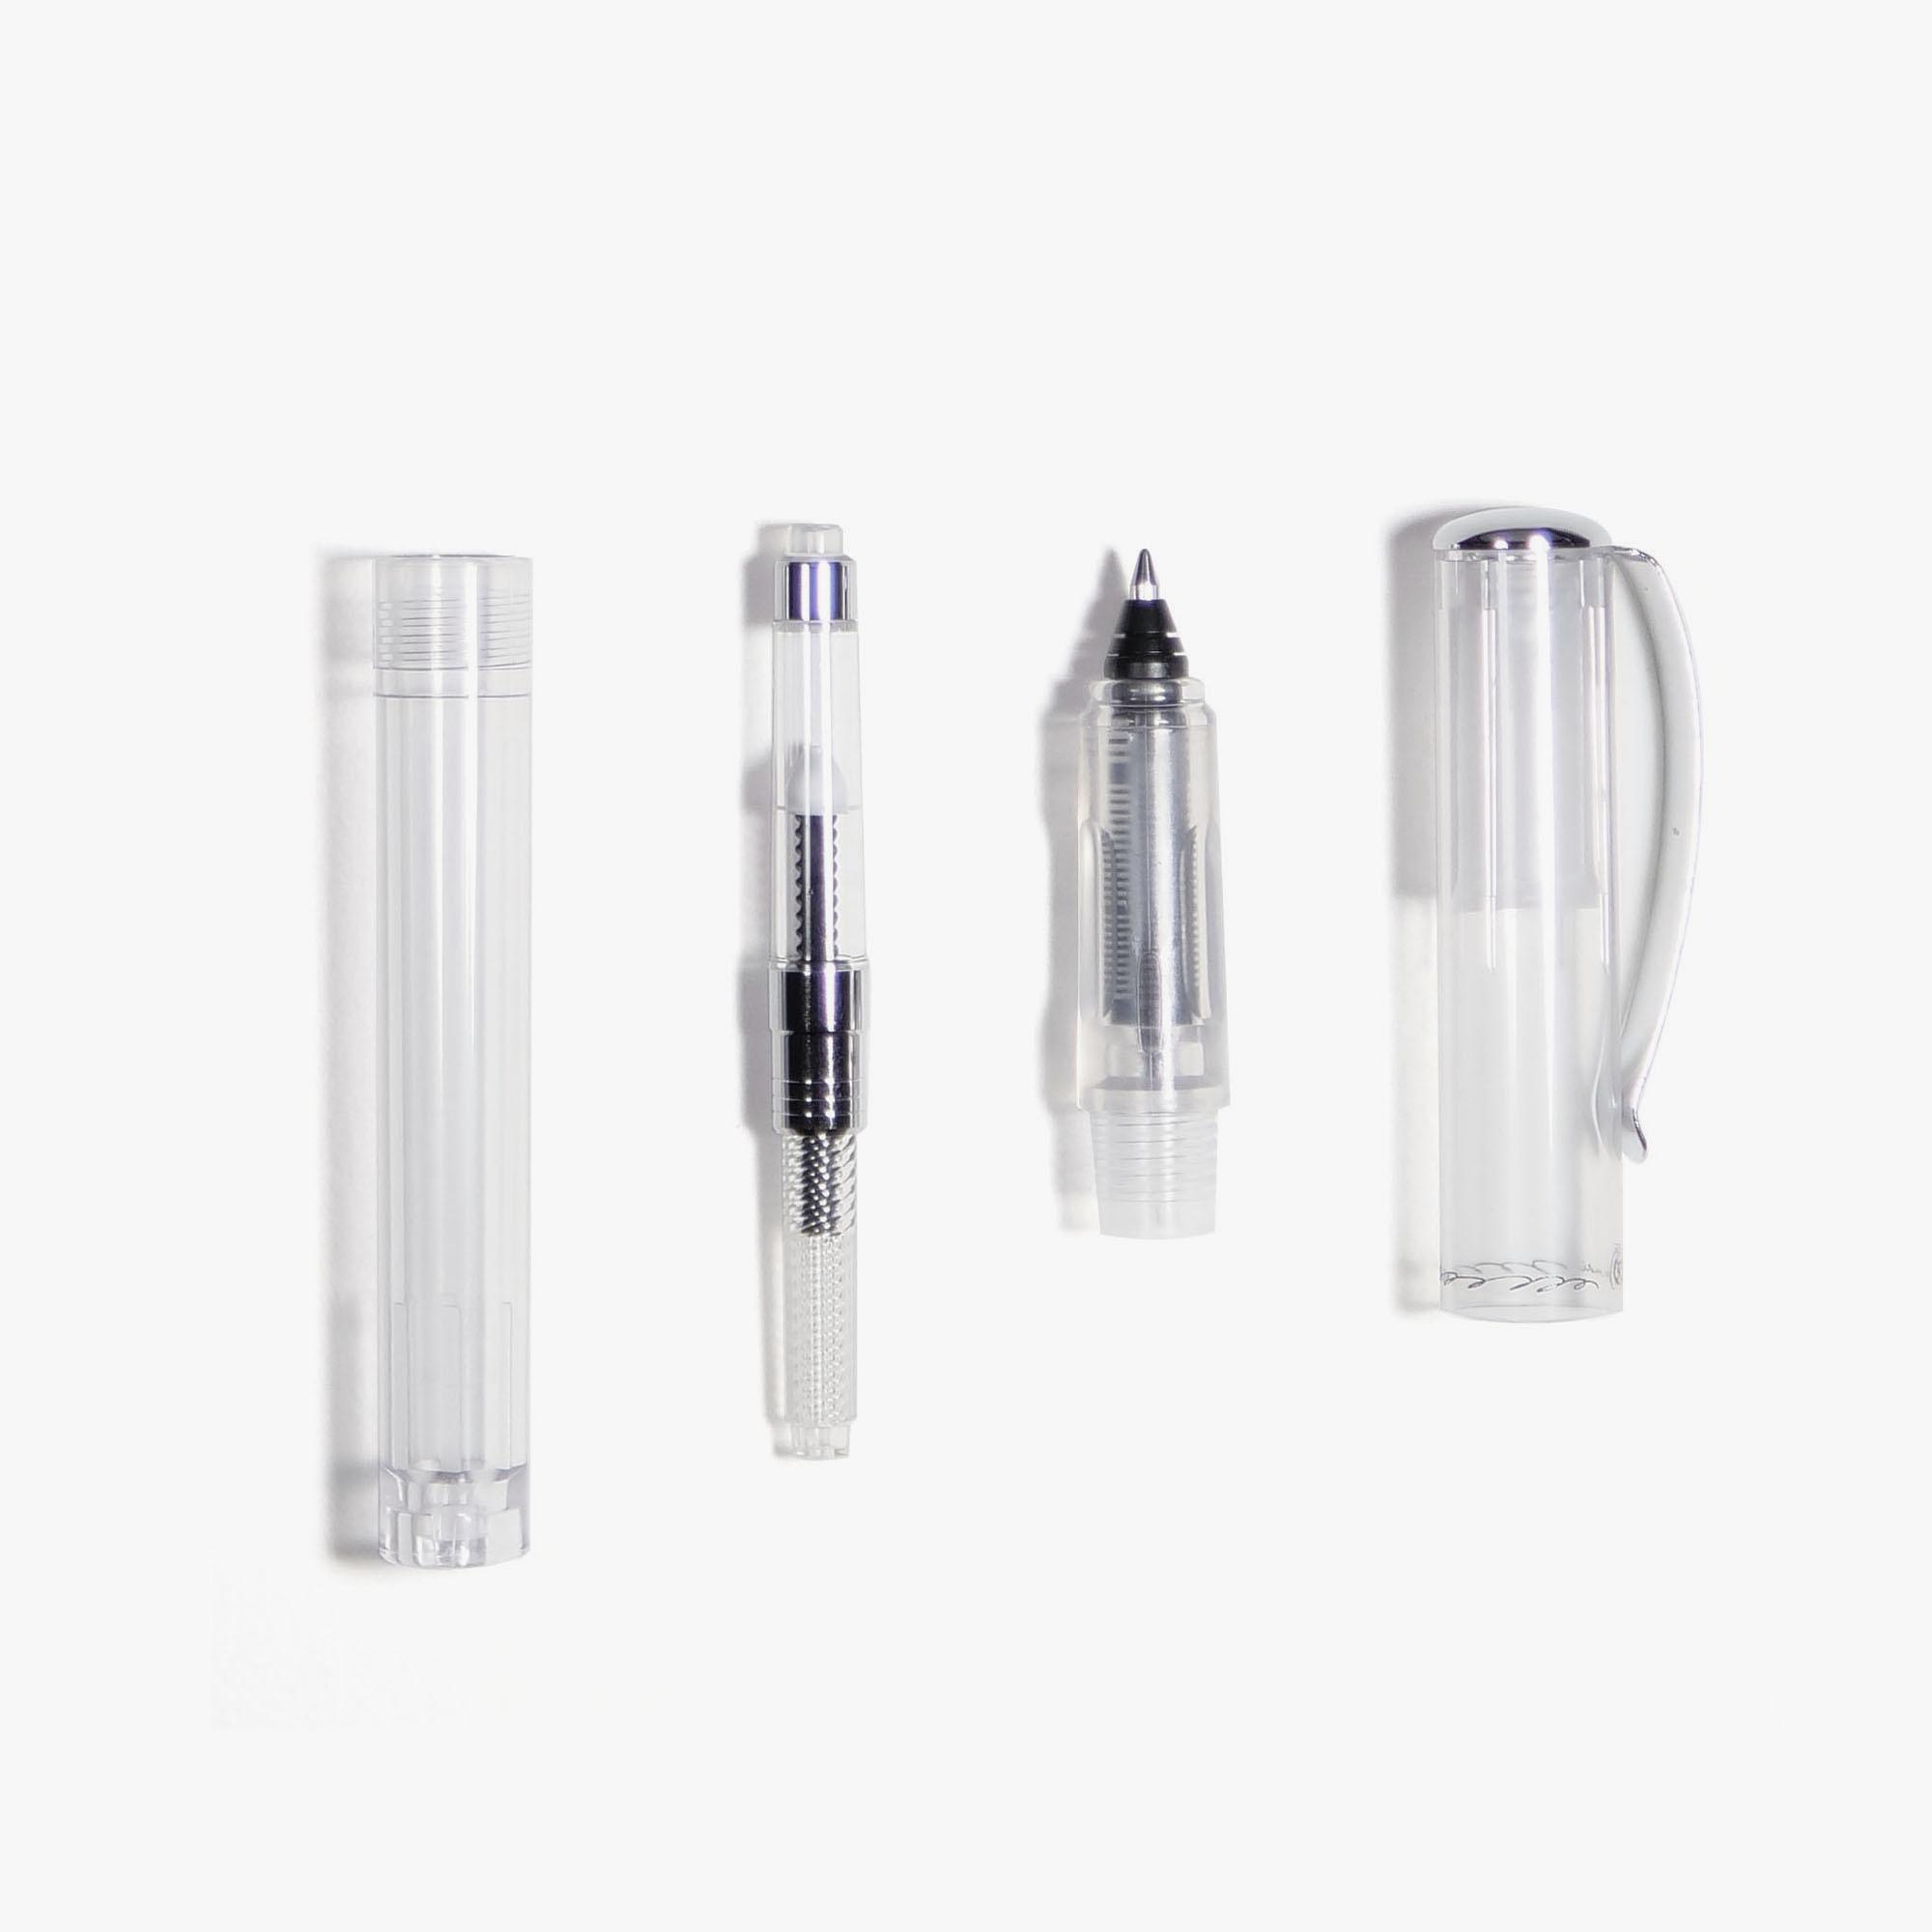 Kakimori Rollerball pen